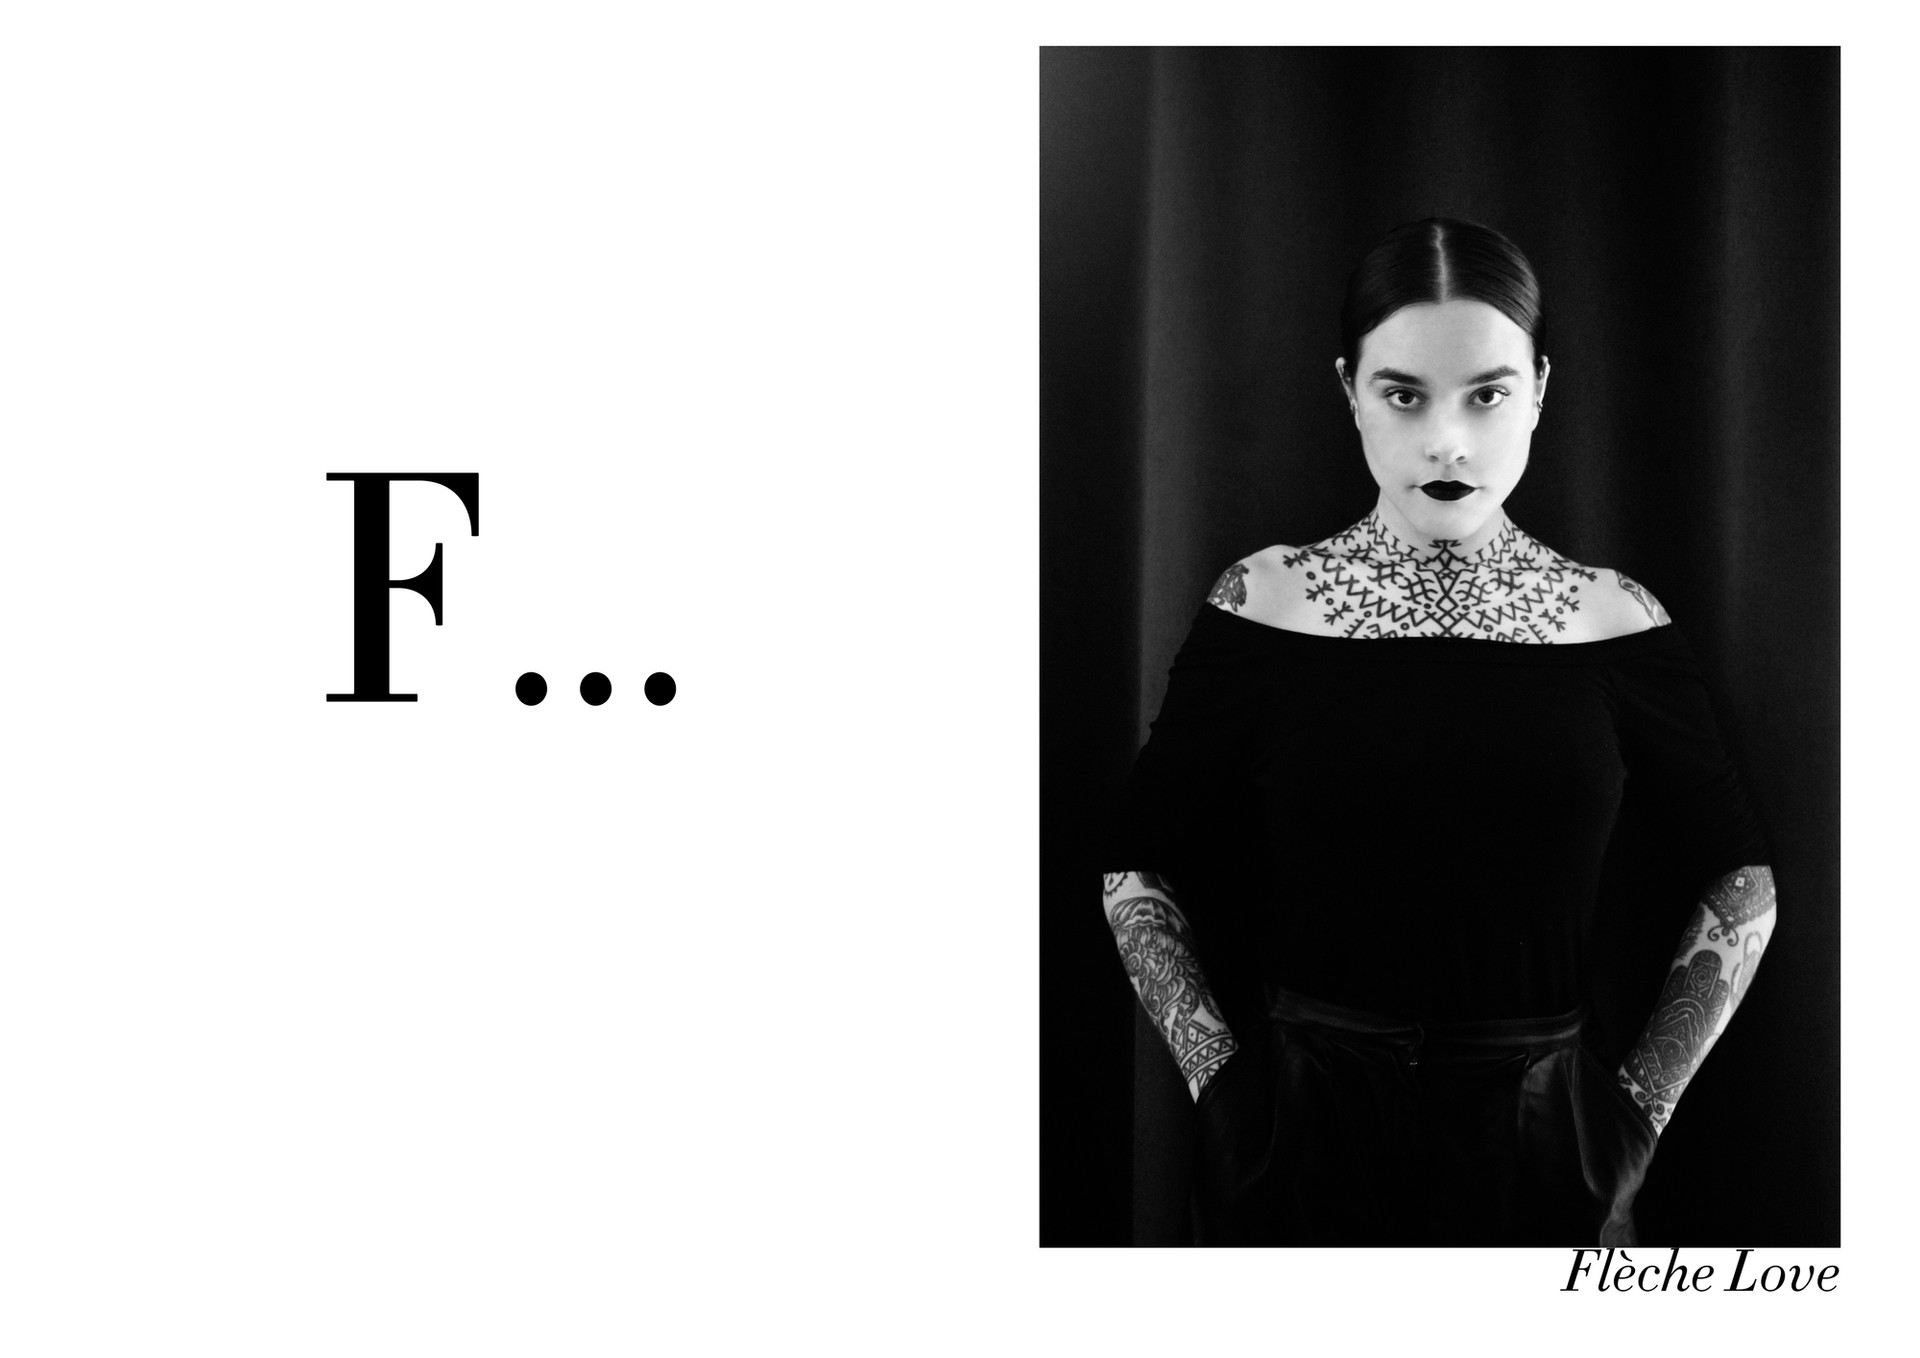 Flèche Love par Nicolas Vidal  #chanteusesdefrance